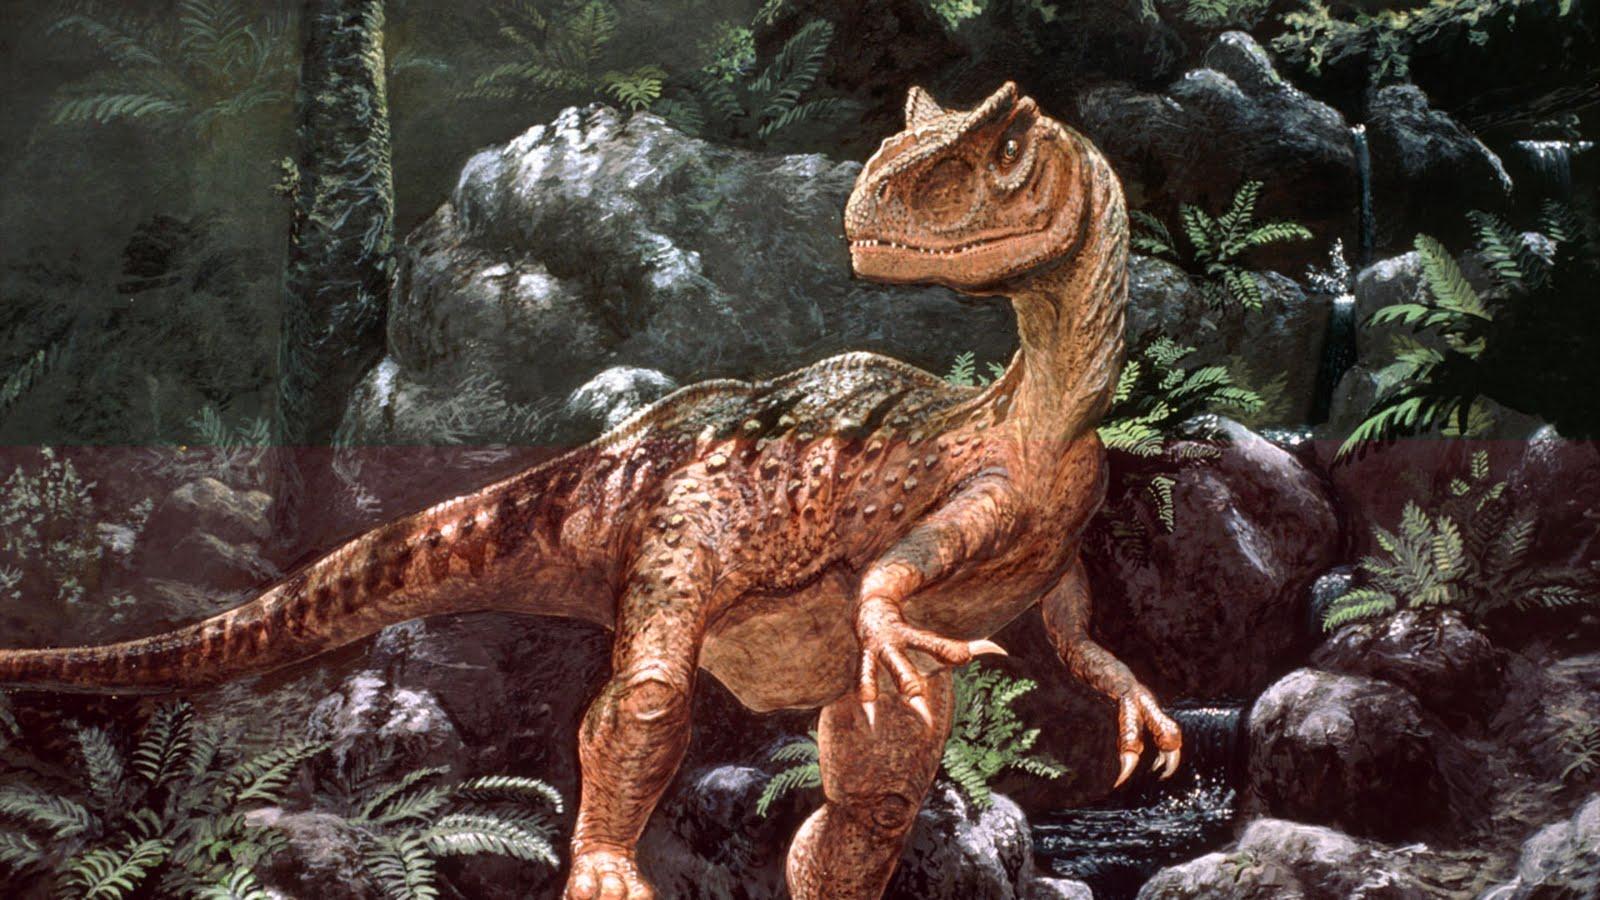 http://1.bp.blogspot.com/_3UZ_N8Qdang/TJNn5lidmWI/AAAAAAAADfw/UJvBp-accus/s1600/allosaurus-artwork-sc5818-xl.jpg